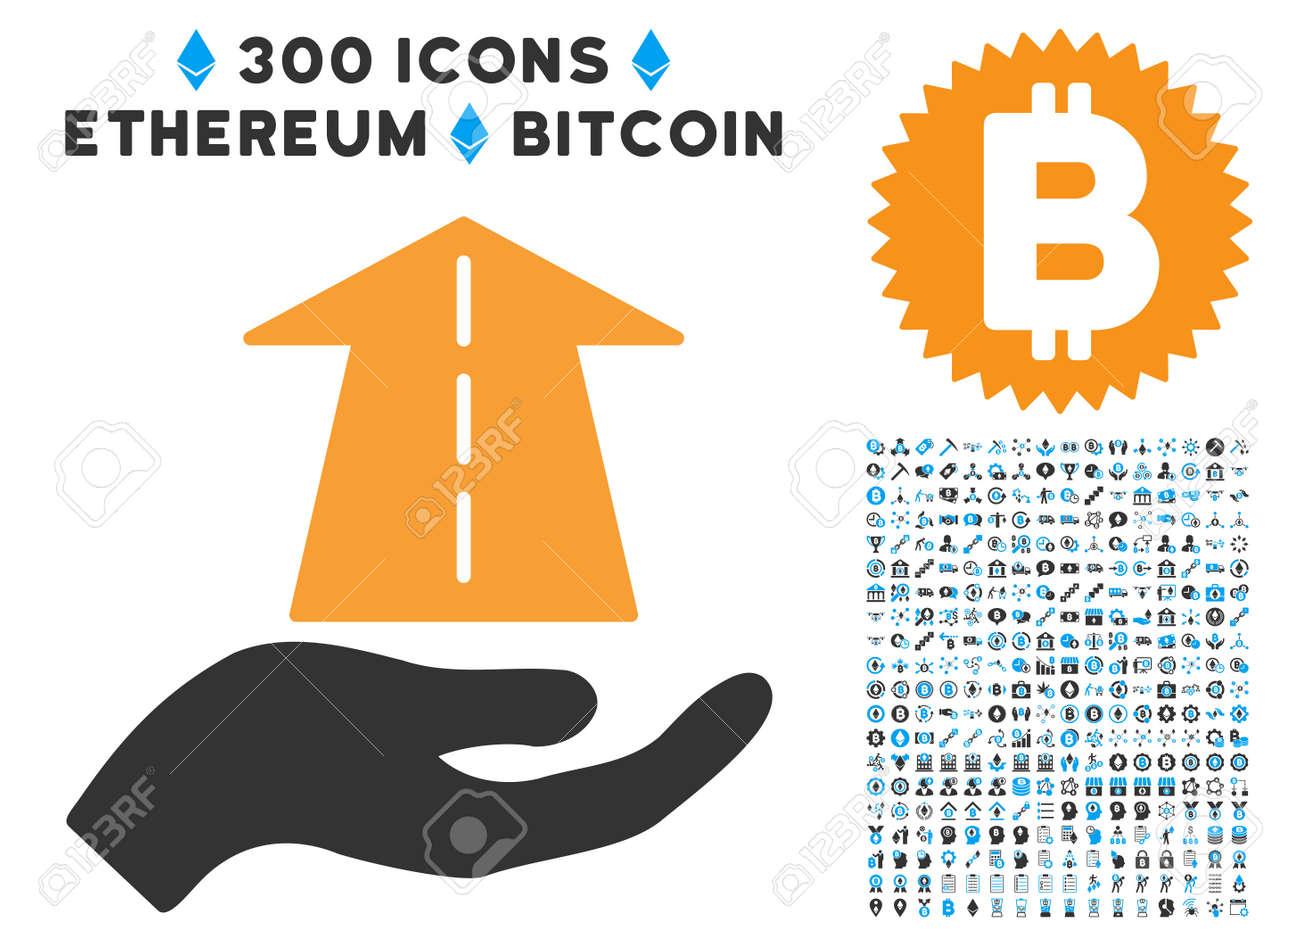 Minergate bitcoin wallet